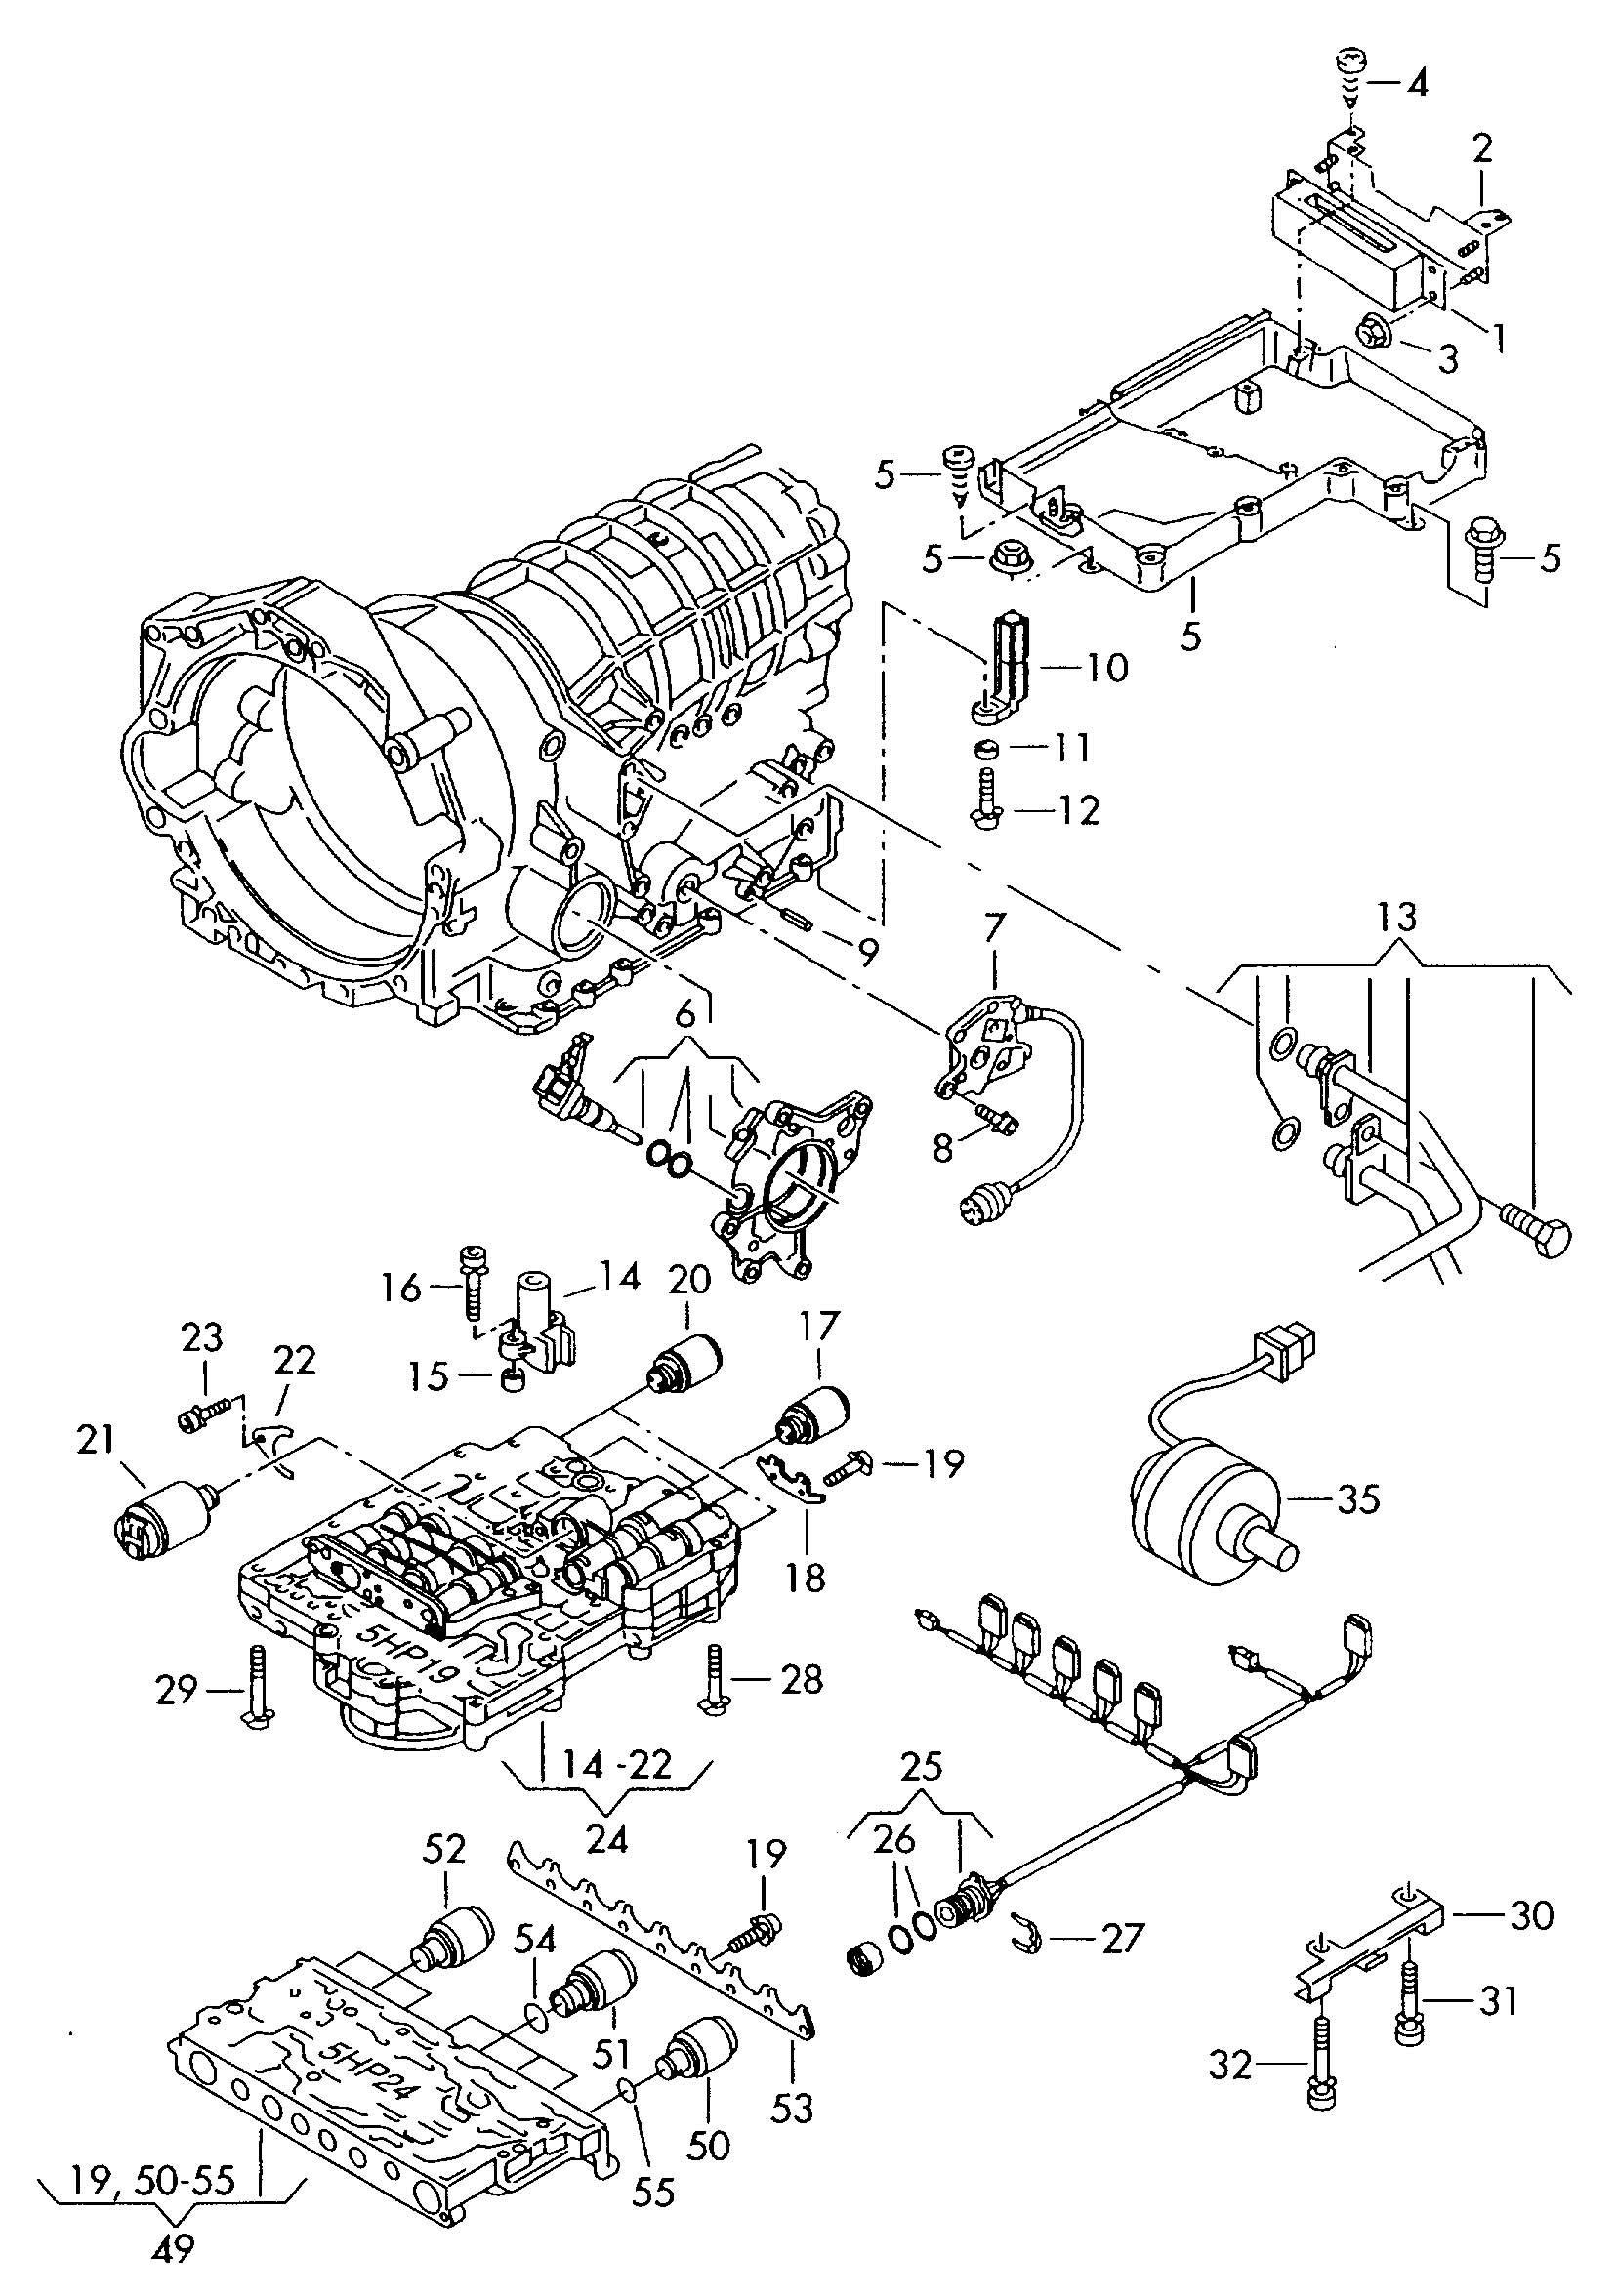 Vw Routan Engine Diagram